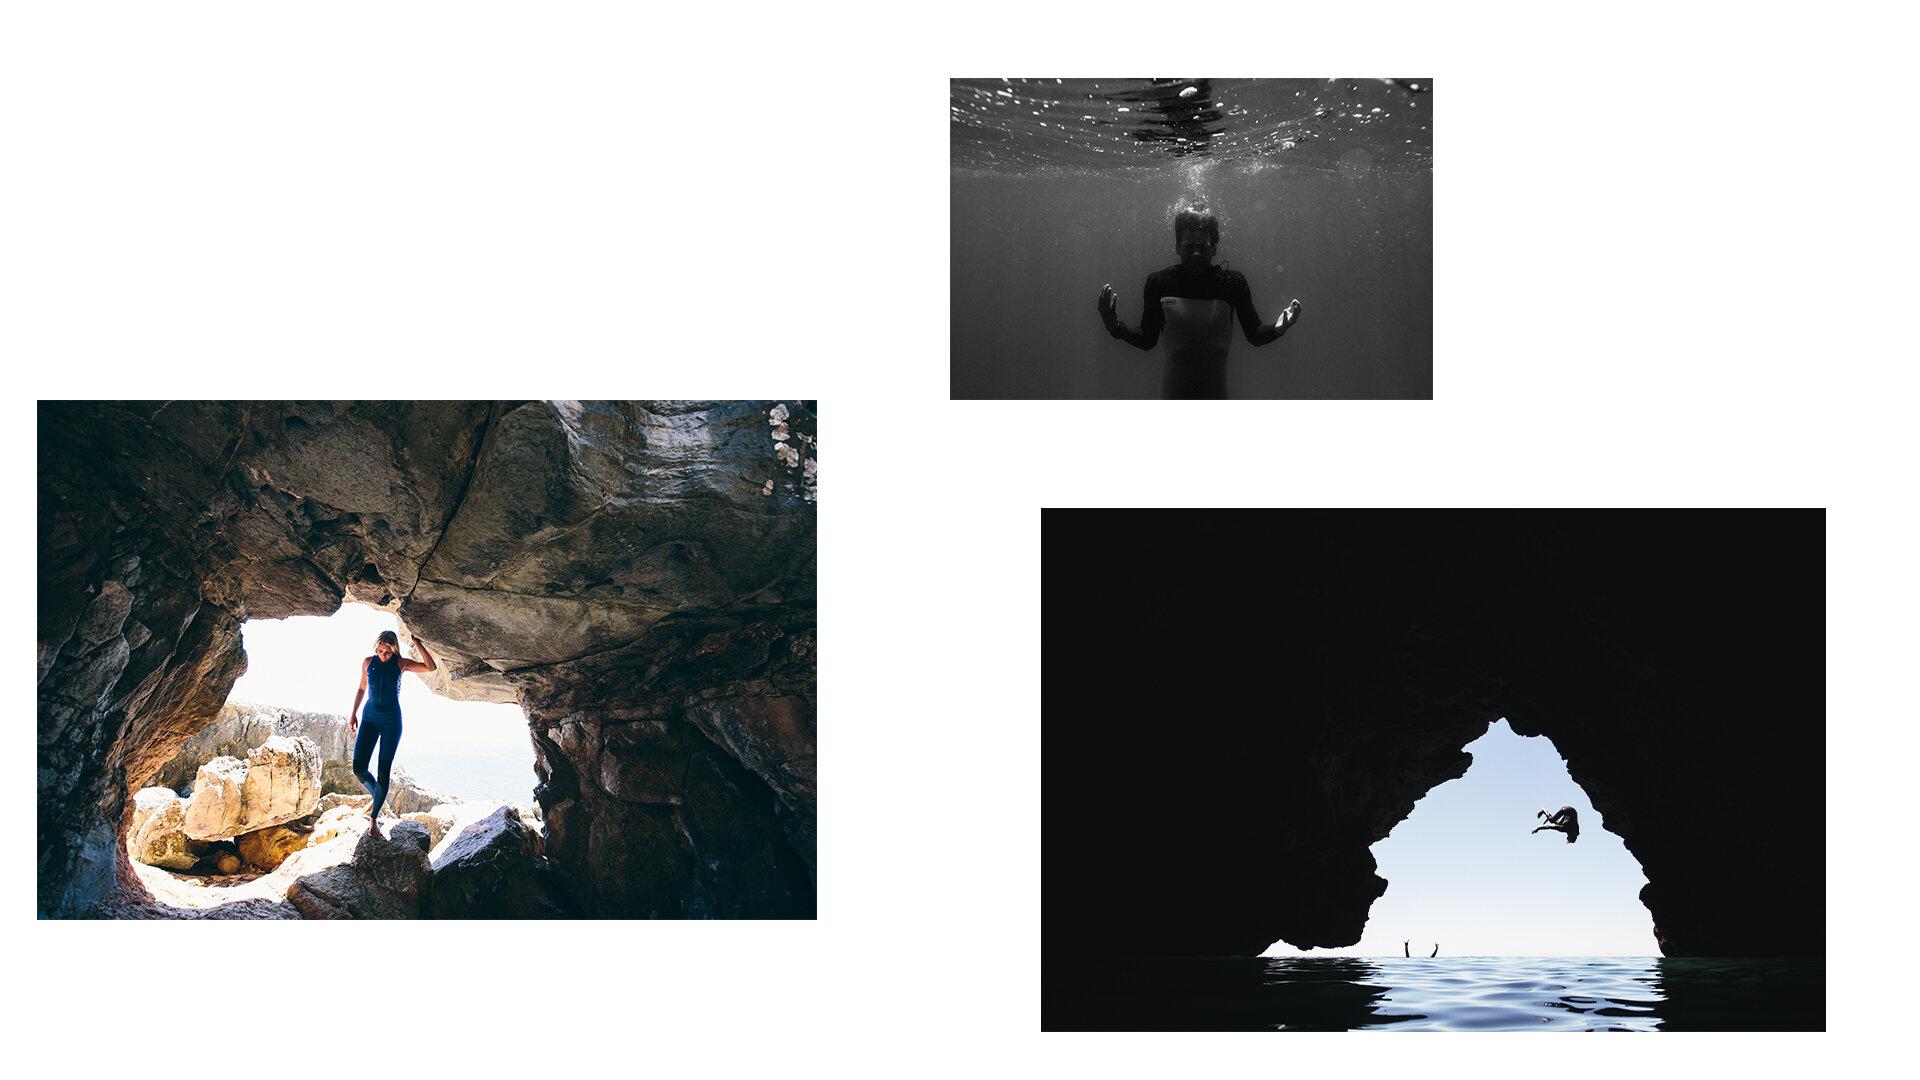 toby-butler-tobybutlerphoto-surf-surfing-waterphotography-ocean-Oneill-wetsuits-swimwear-girl-bikini-clothing-surf-portugal-lifestylephotography-7.jpg